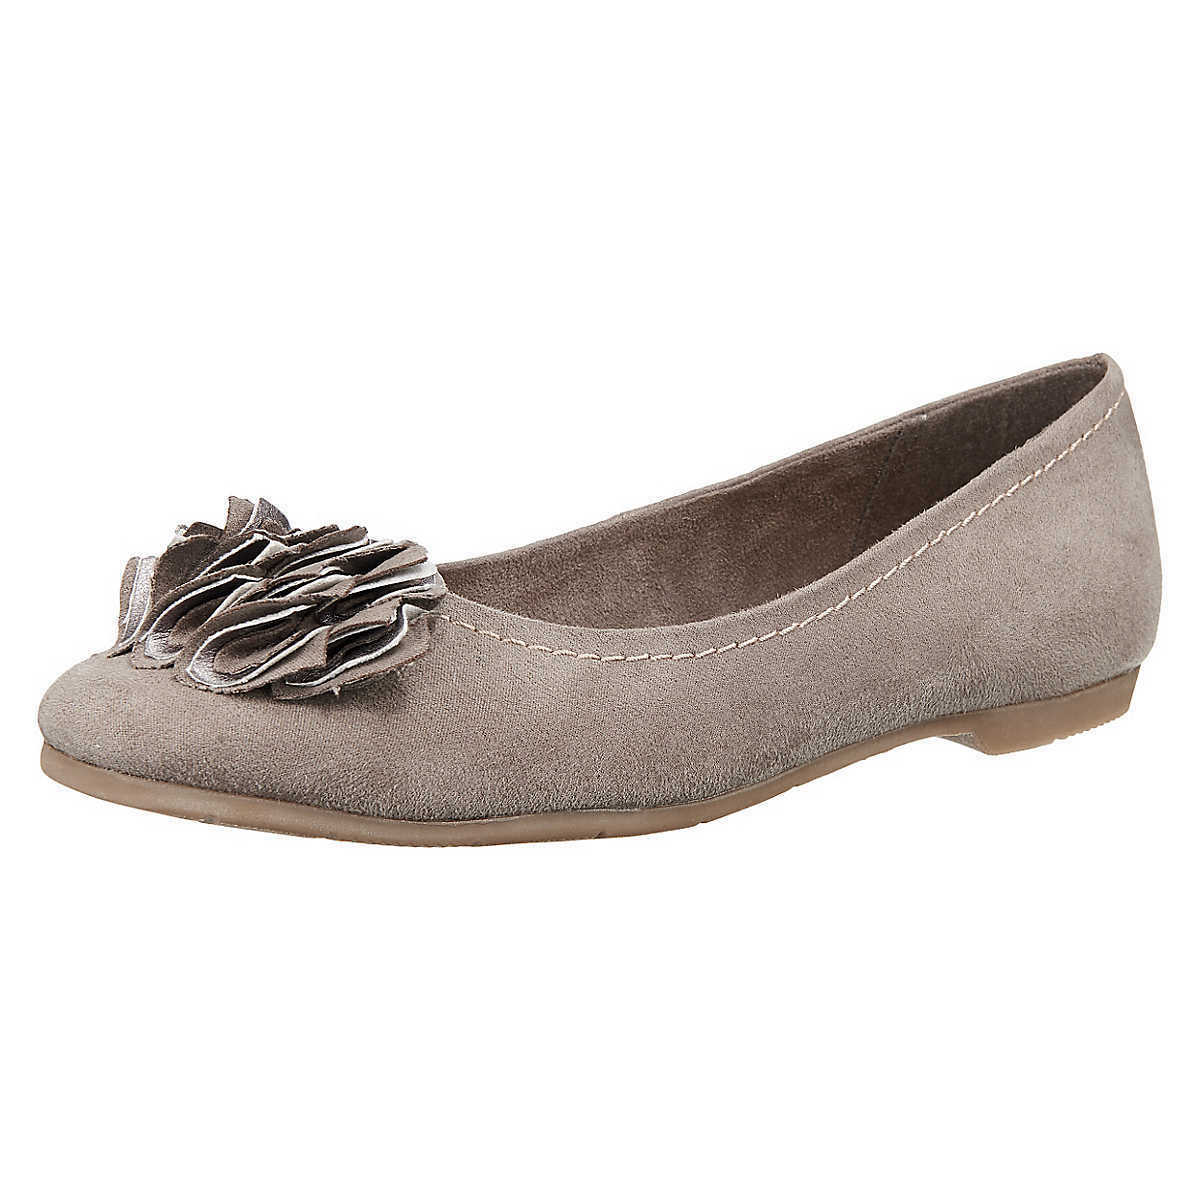 MARCO 40 TOZZI Ballerinas Damen zapatos  Slipper Gr. 38 40 MARCO beige Neu 621248